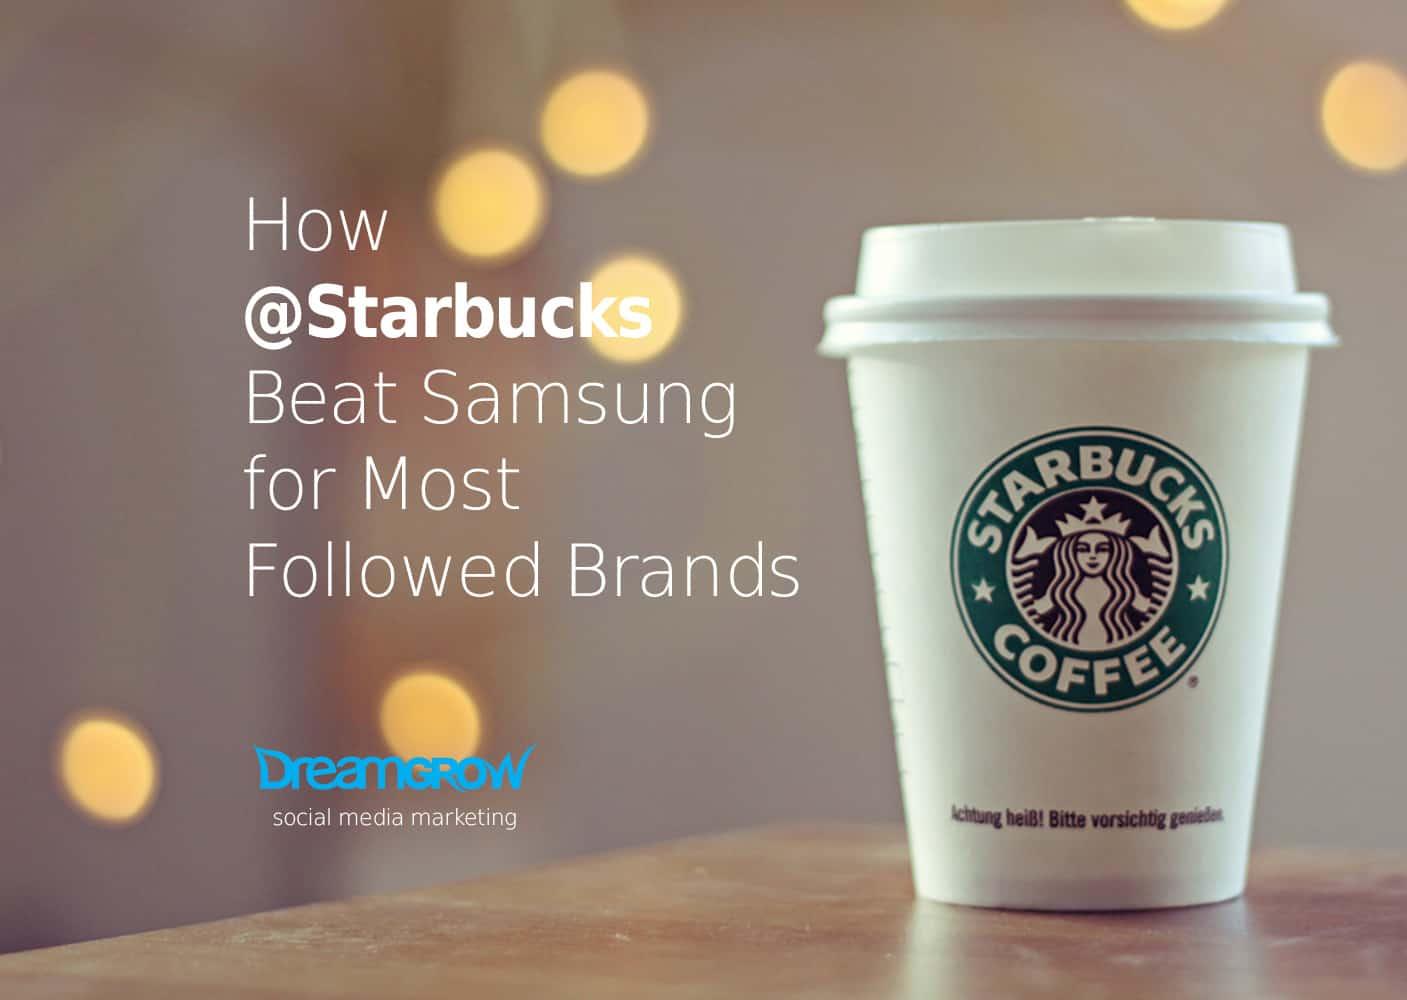 starbucks most followed brand